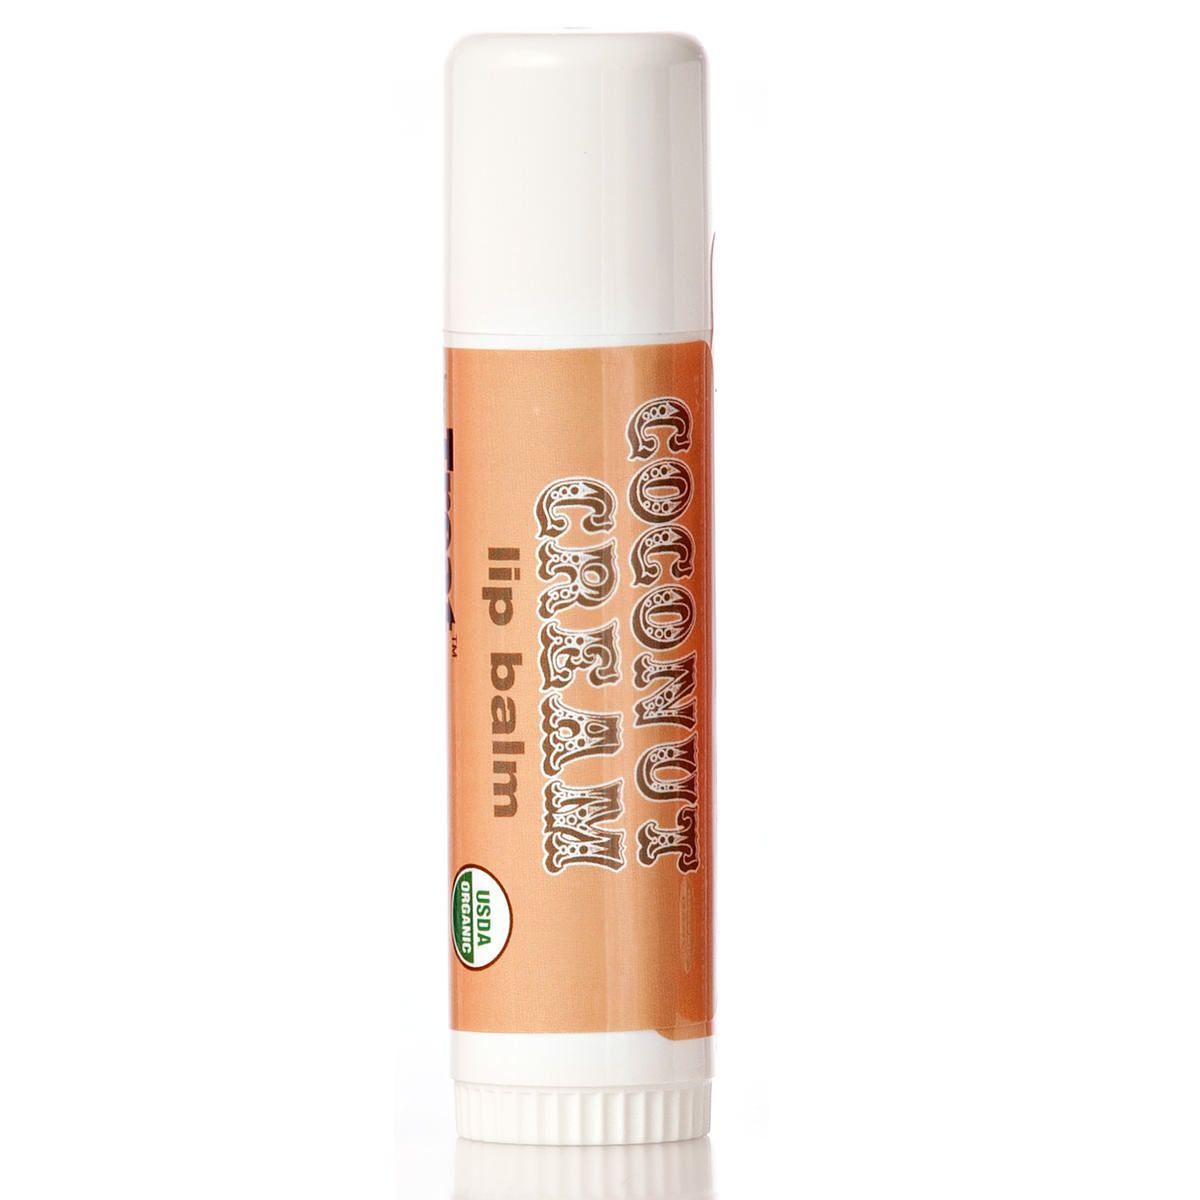 Treat Beauty - Lip Scrub Marshmallow Cream - 0.5 oz. (pack of 1) Clarins Gentle Peeling Smooth Away Cream